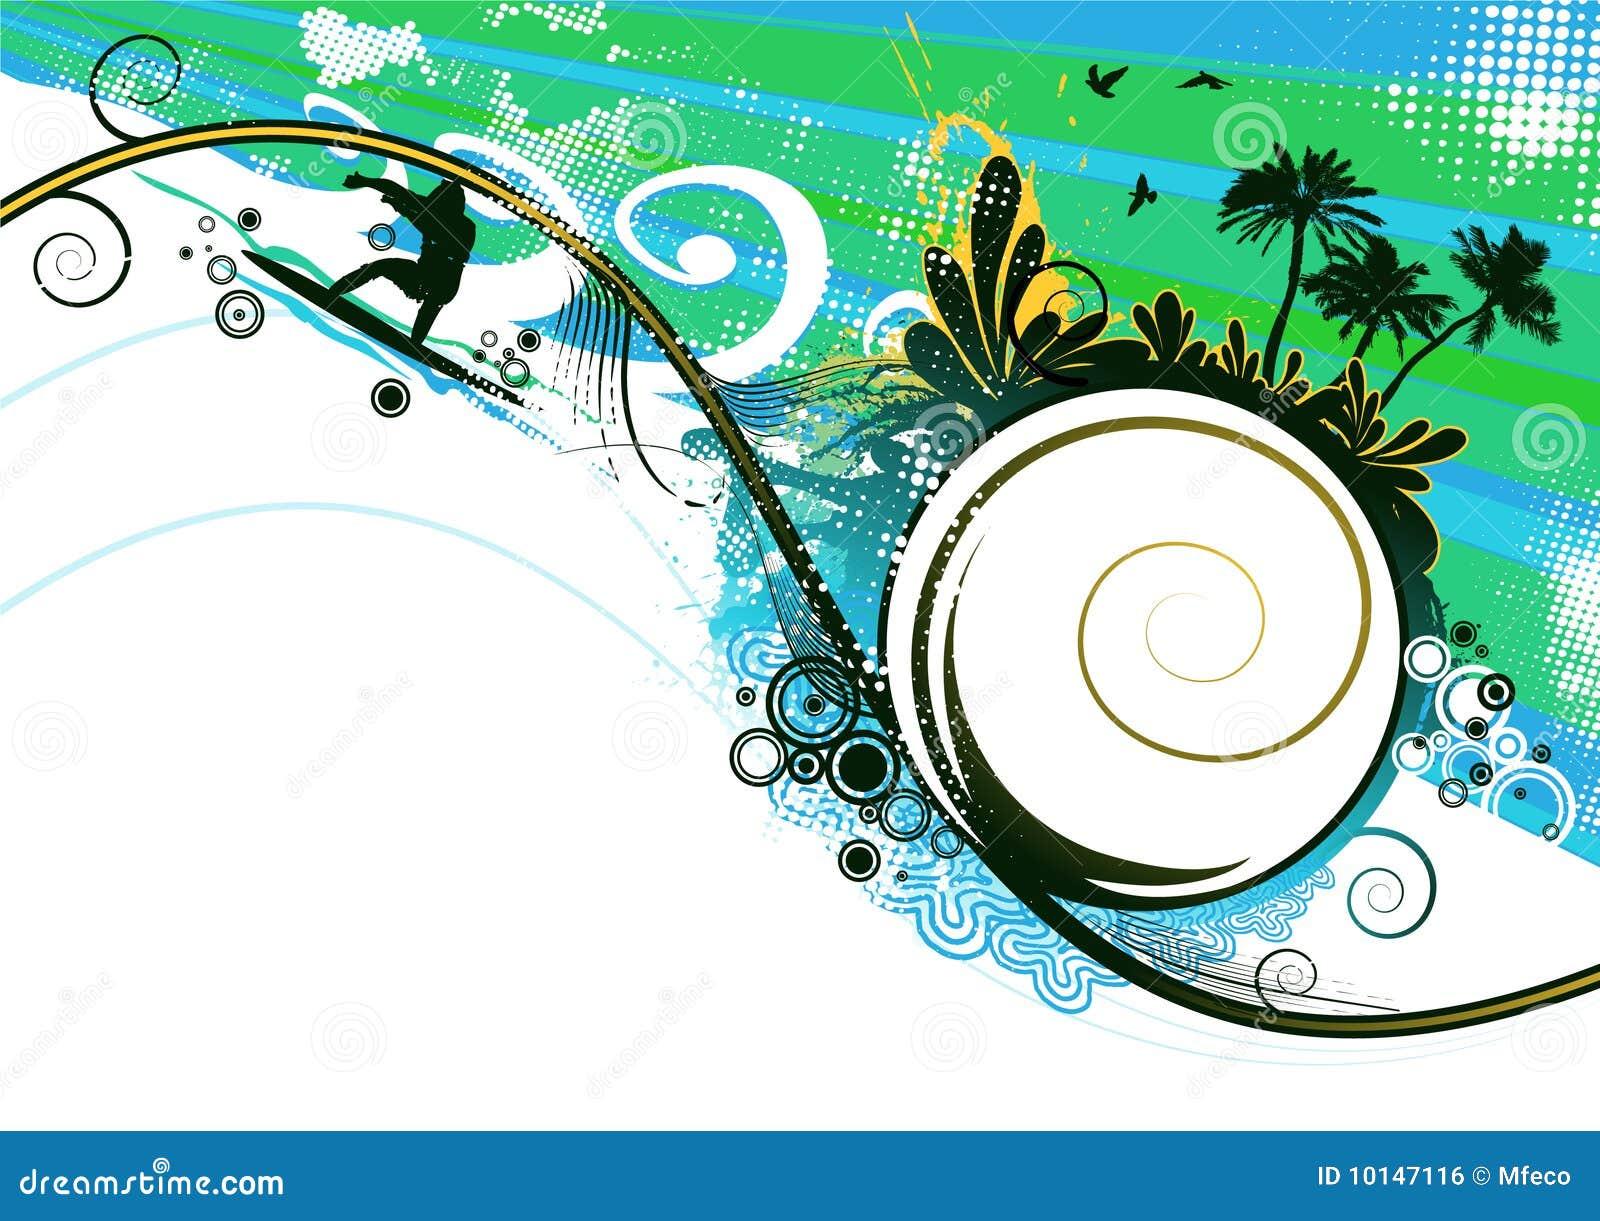 Surfer in summer vector background